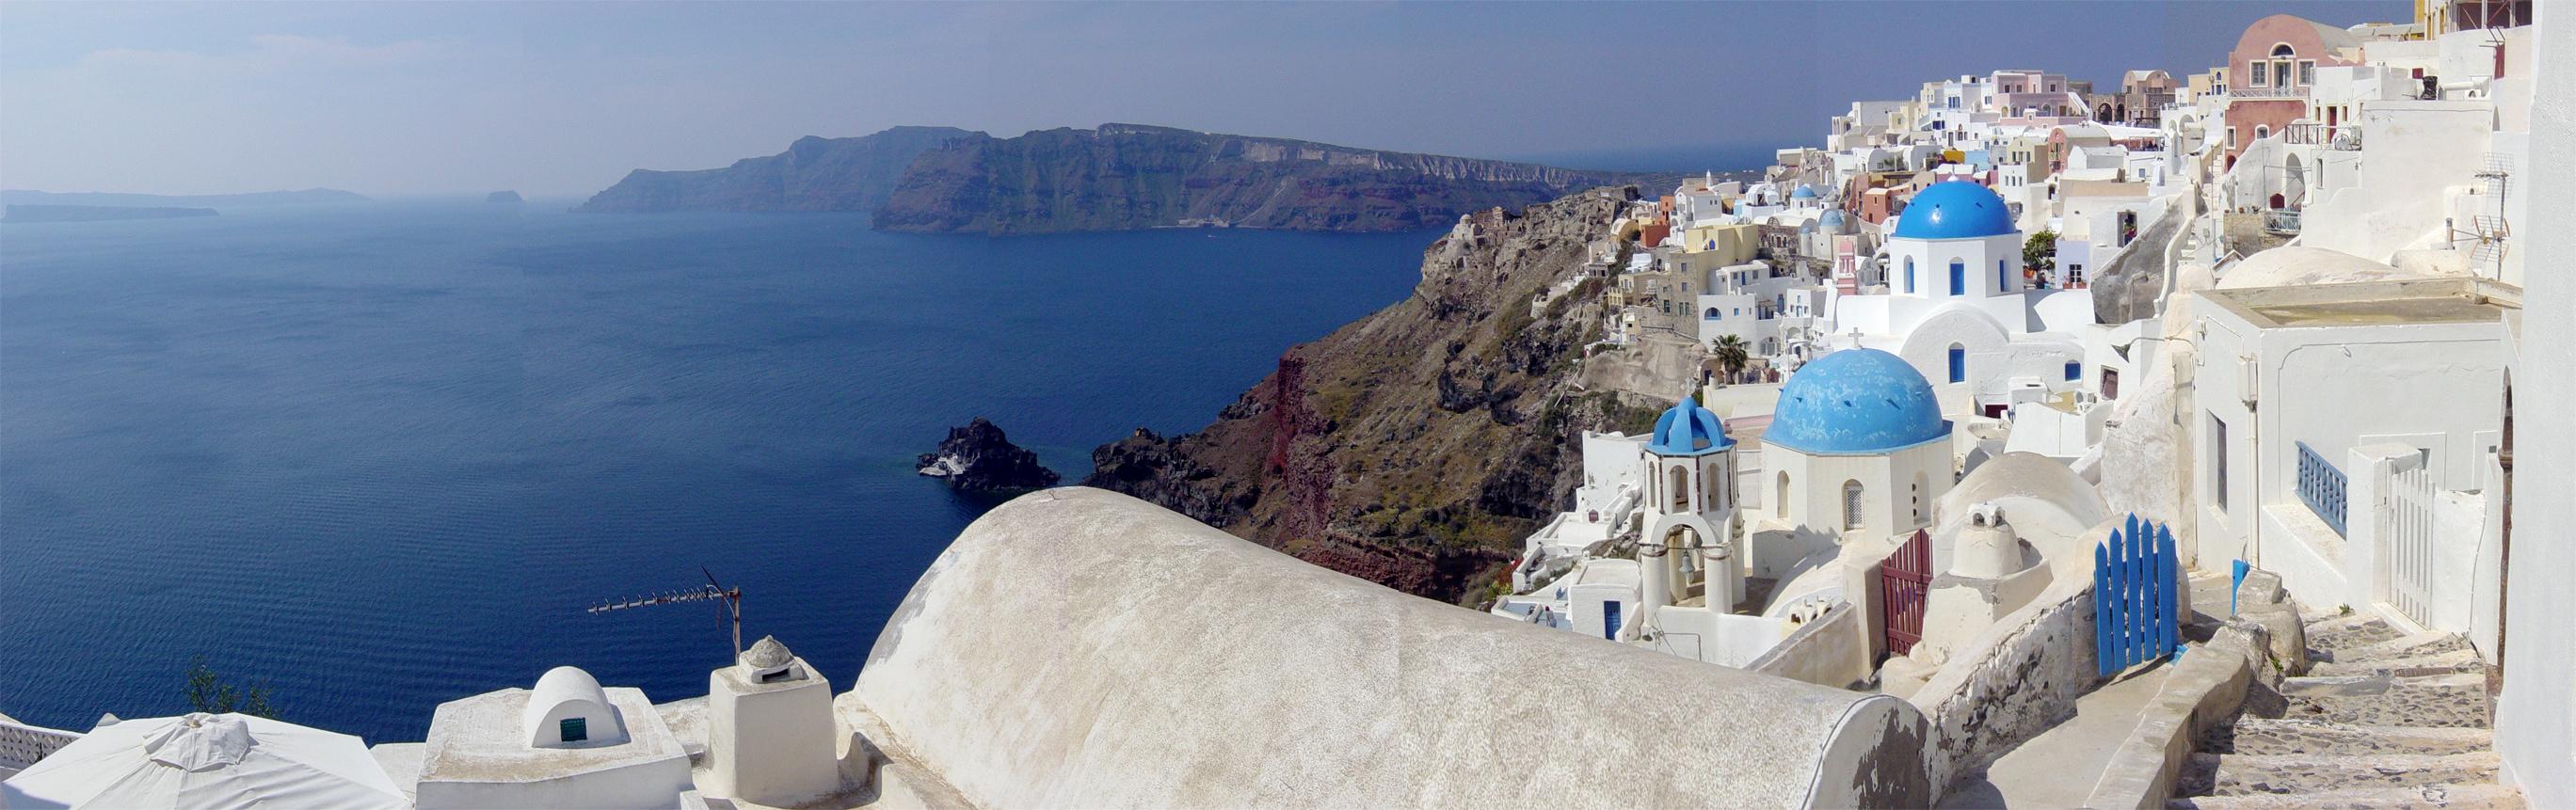 Santorini - Wikipedia